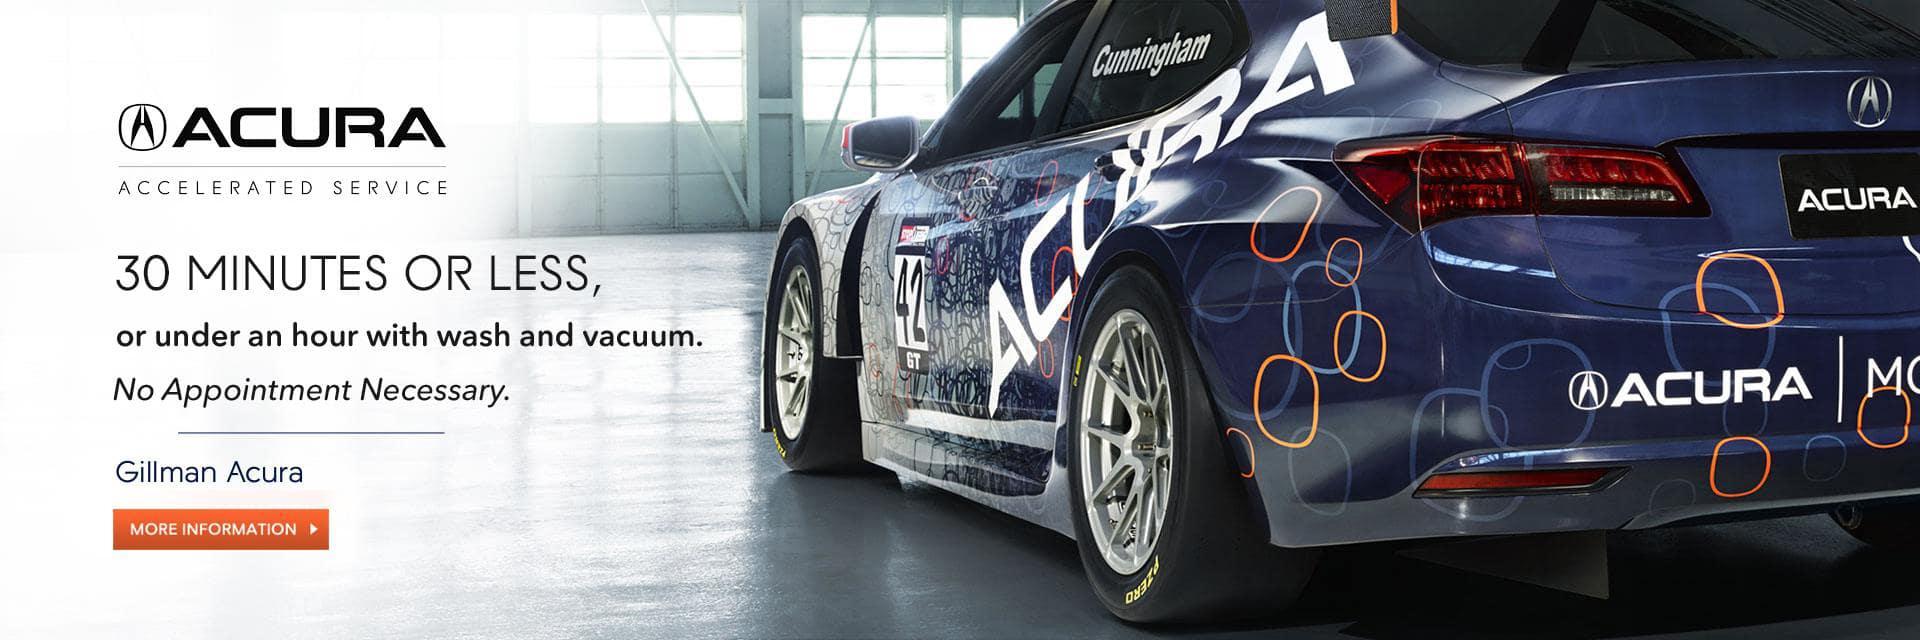 Gillman-Acura-Accelerated-Service